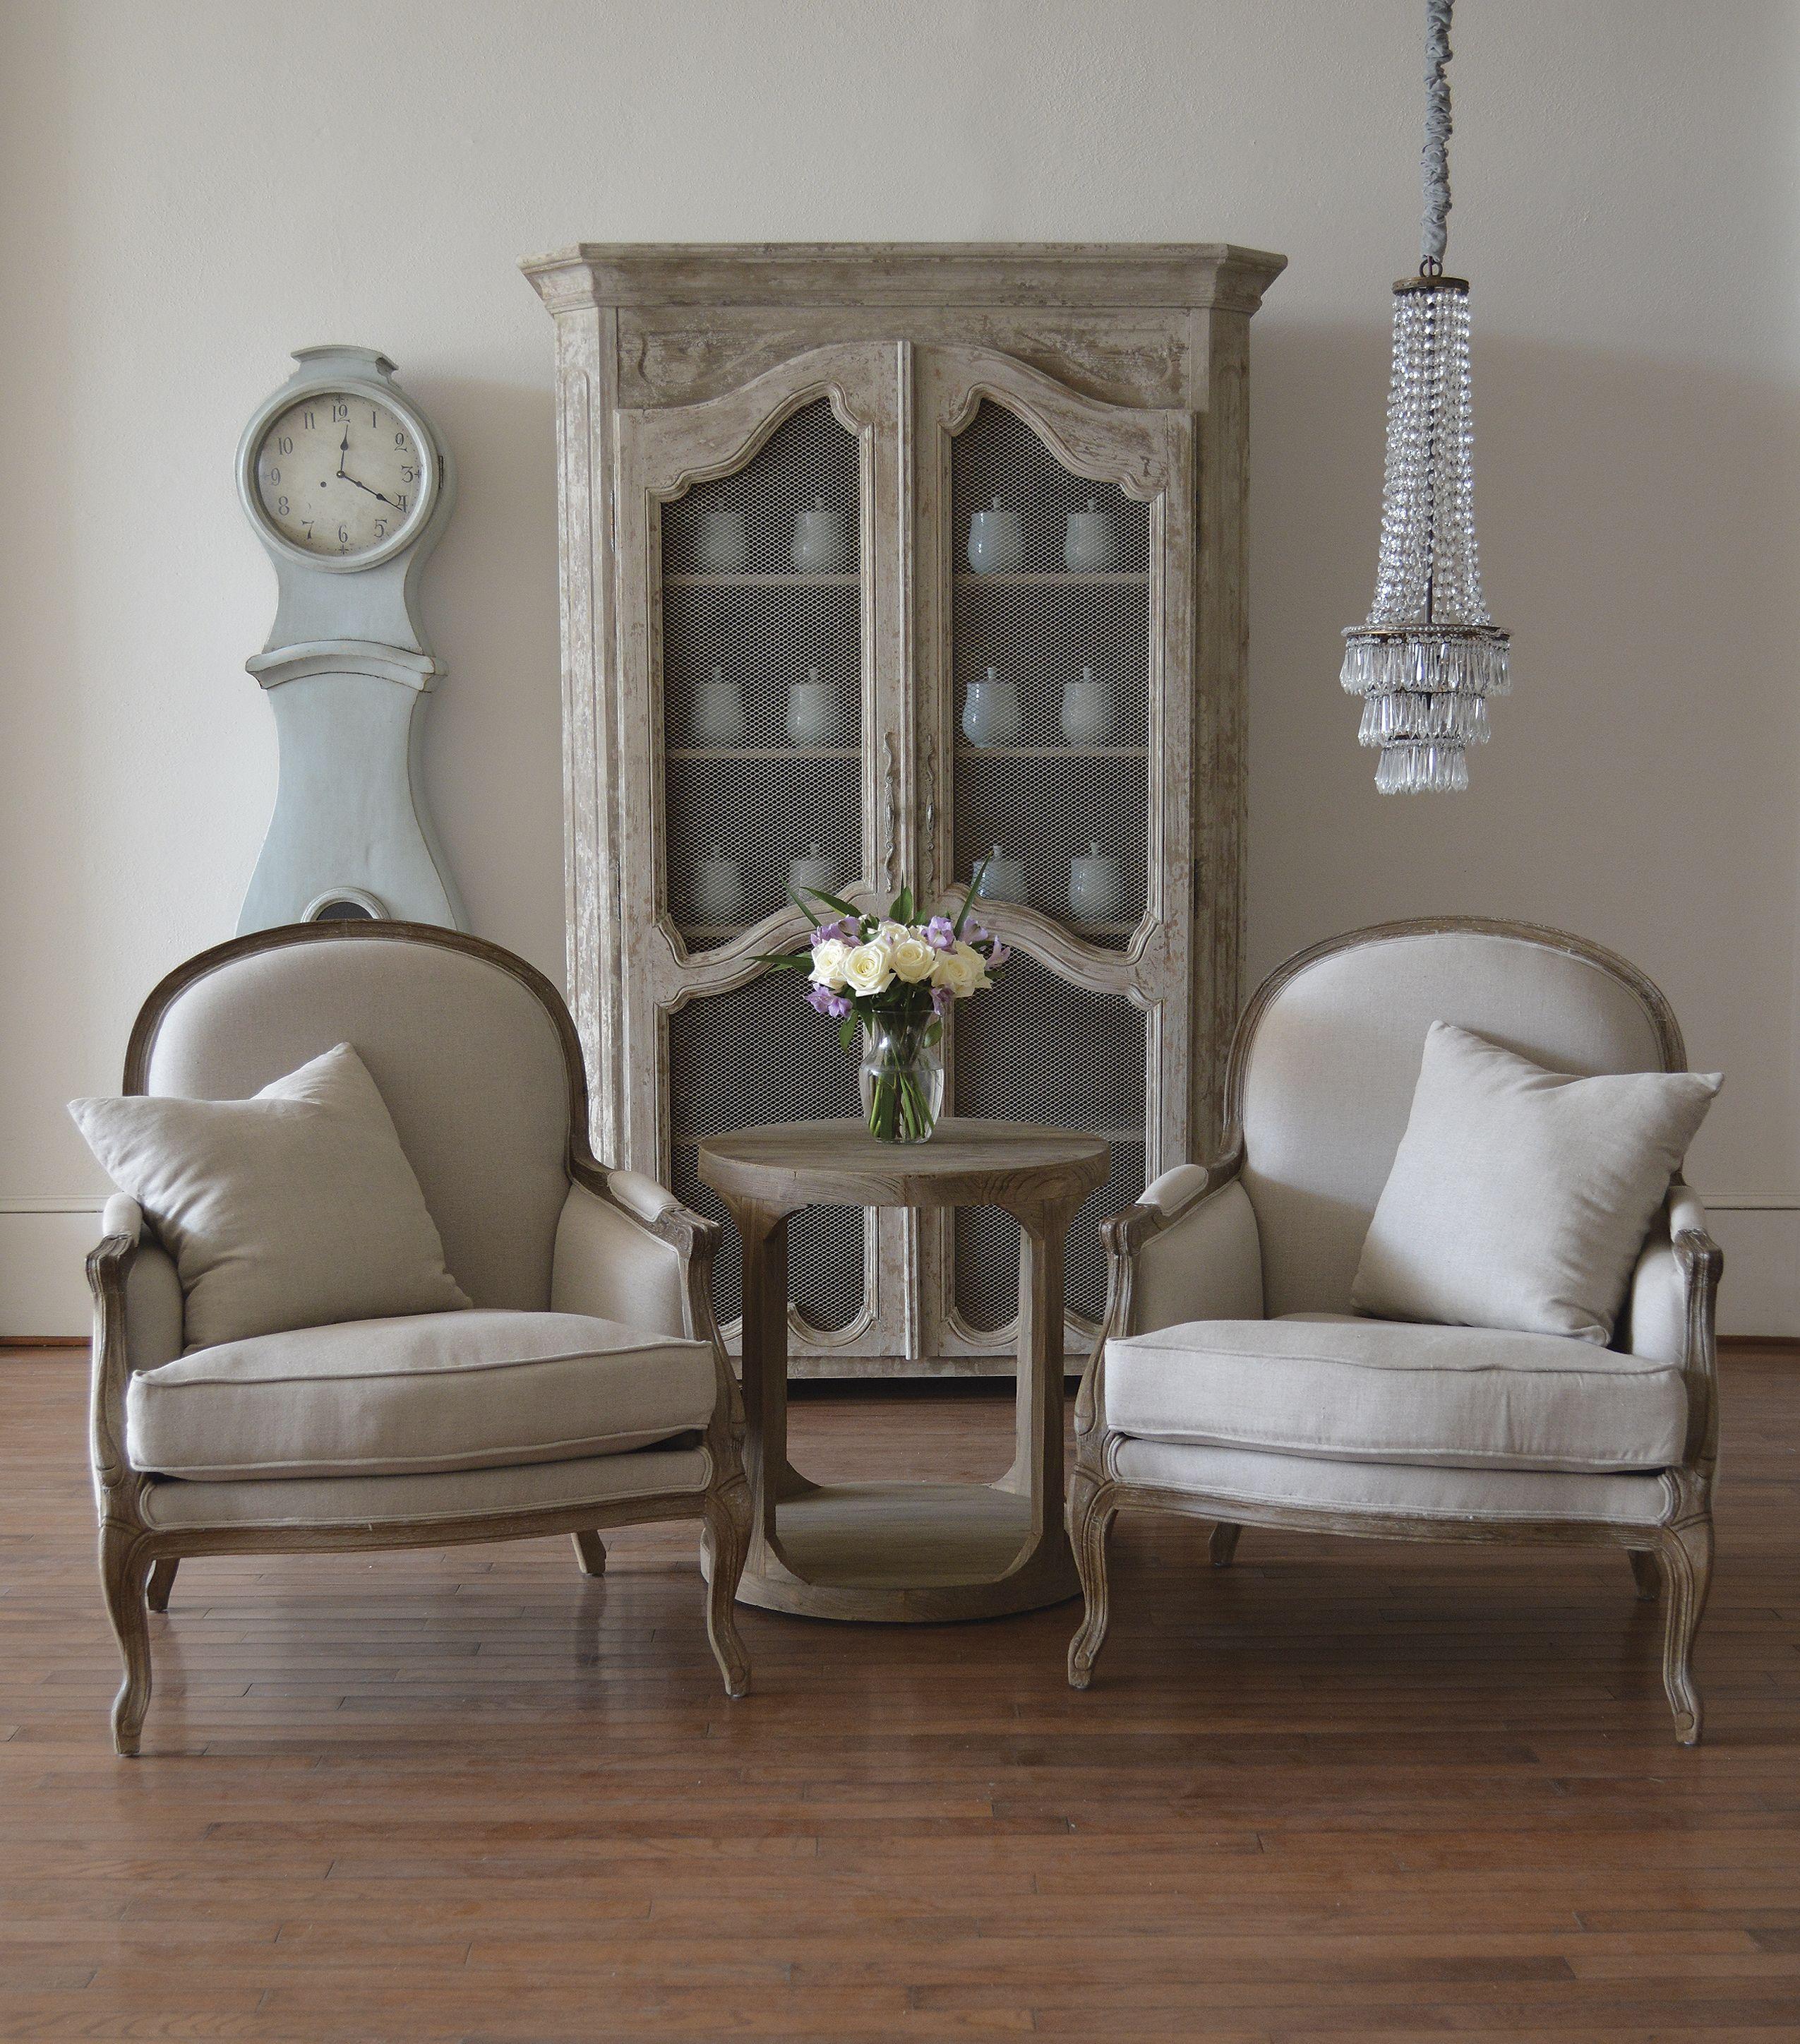 Charmant GJ Styles Furniture